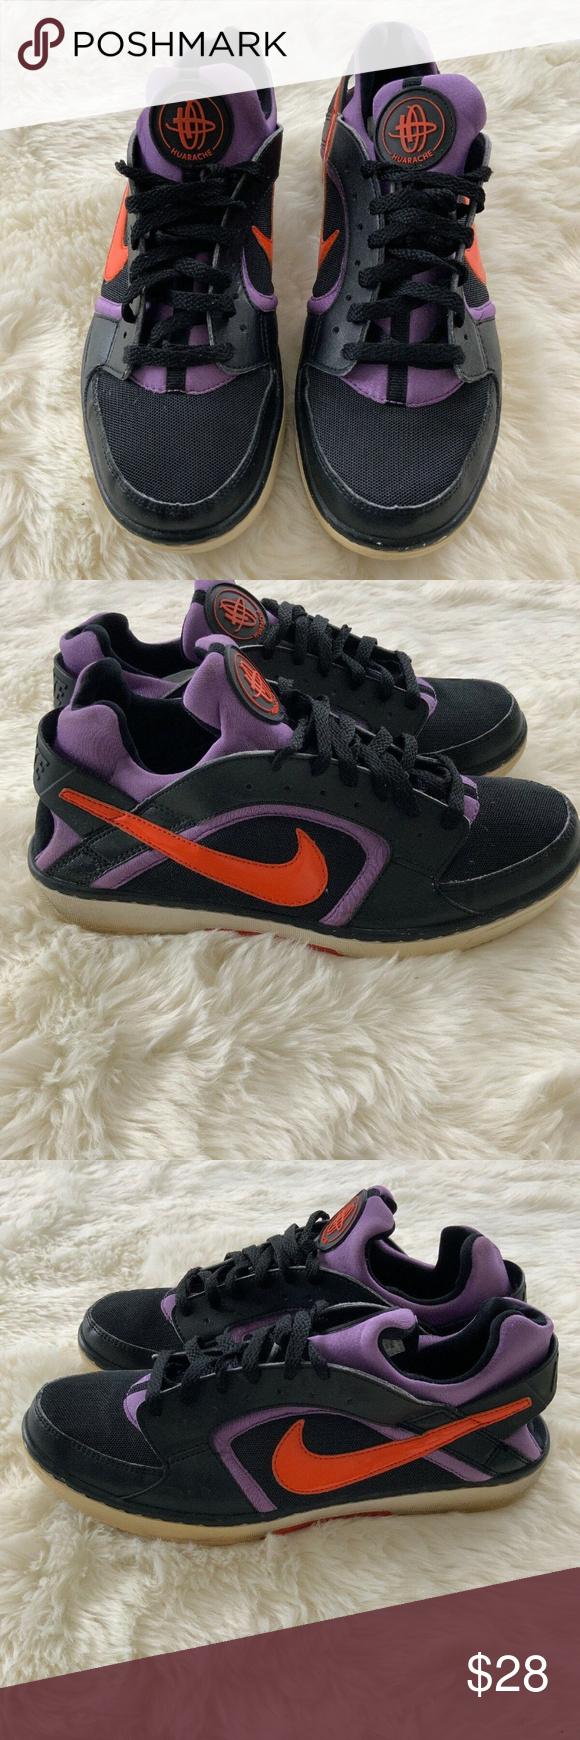 the best attitude 445f8 68981 Nike Huarache Dance Low 2009 Womens 9 Nike Huarache Dance Low 2009 Womens 9  Nike Shoes Sneakers